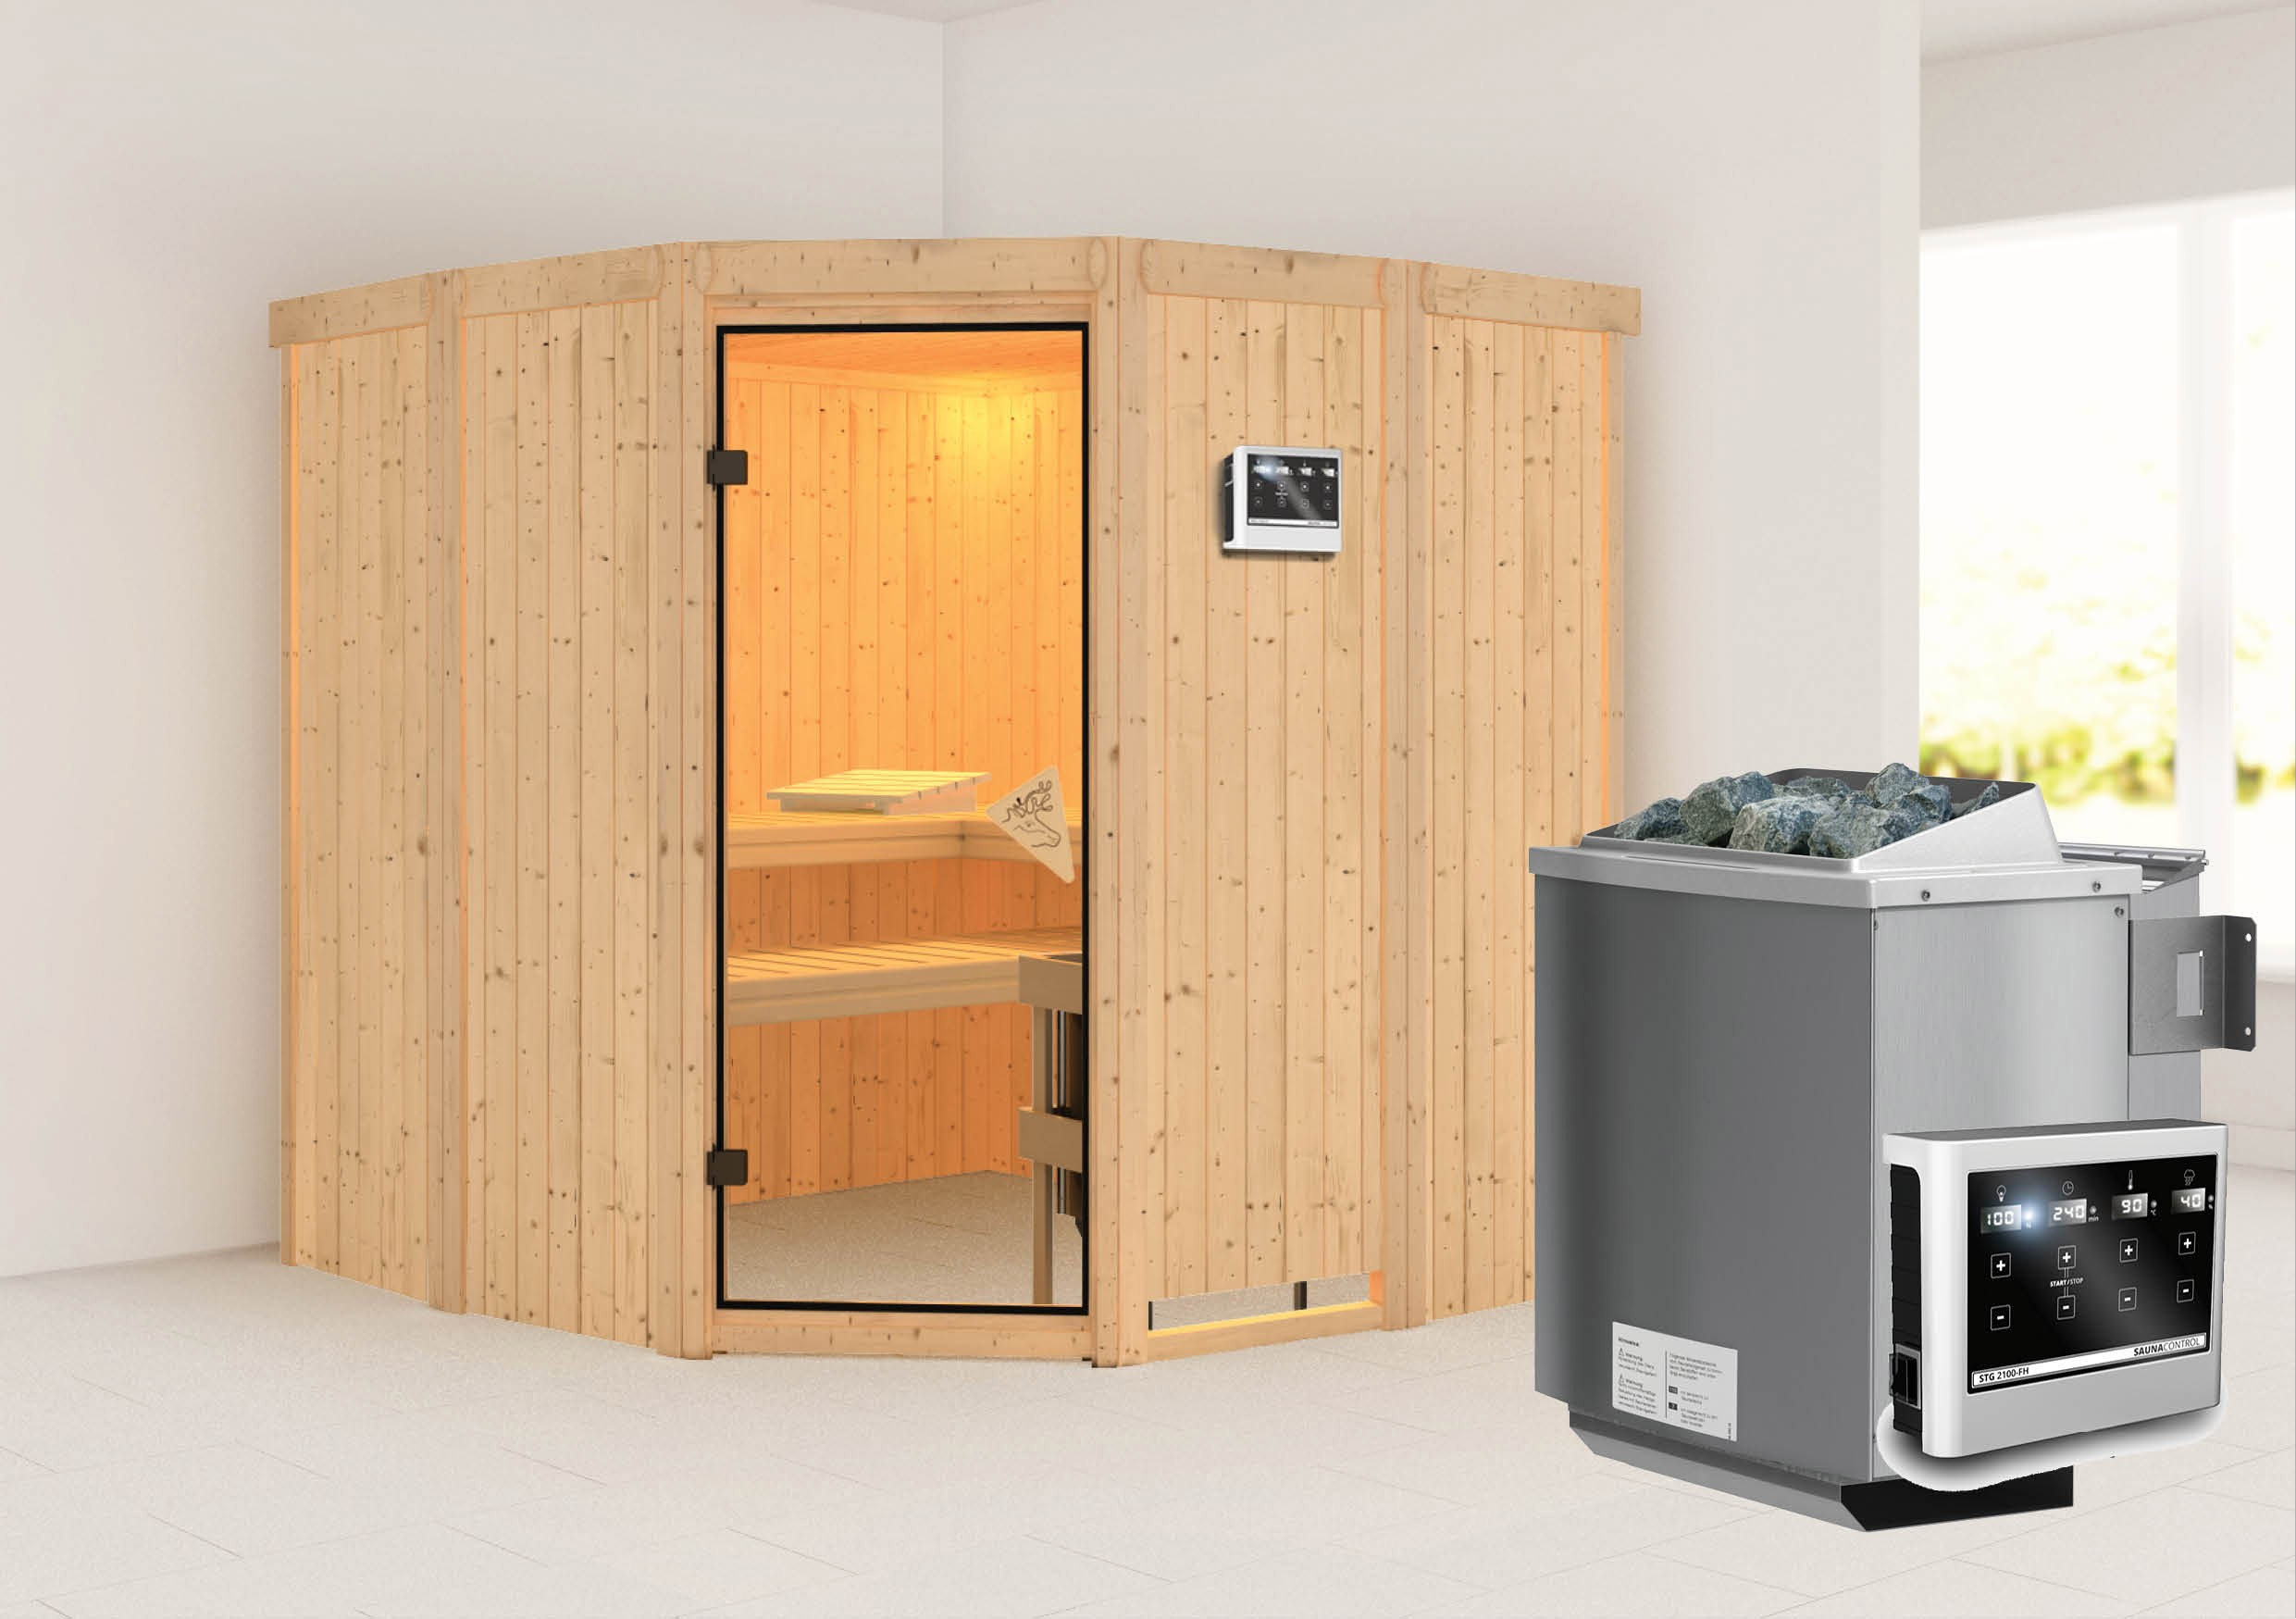 karibu sauna simara1 68mm mit bio ofen 9kw extern classic. Black Bedroom Furniture Sets. Home Design Ideas